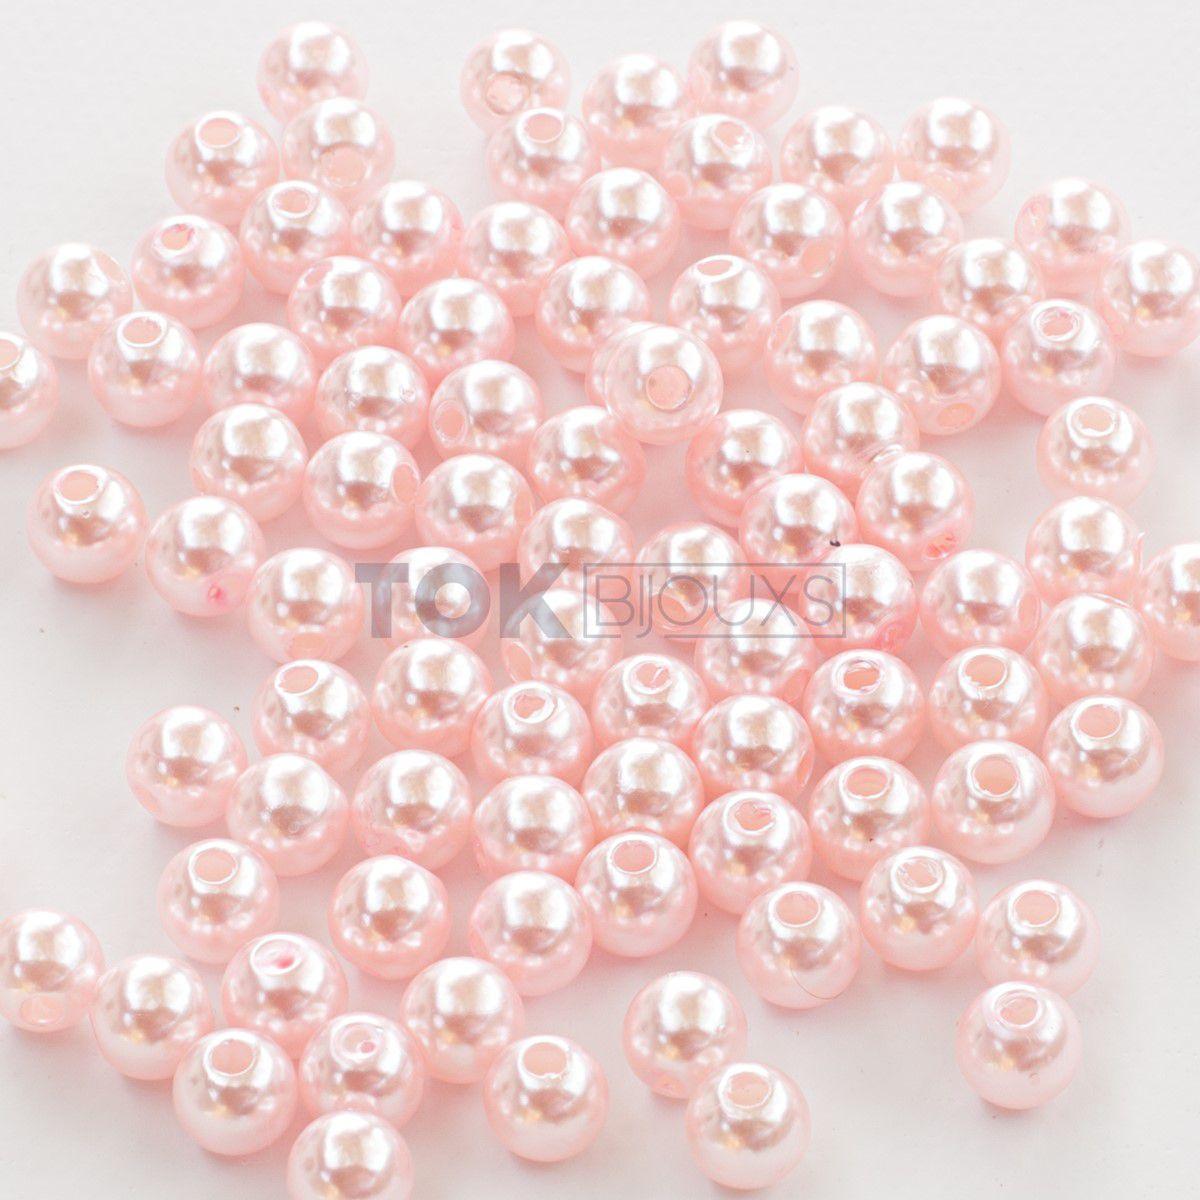 Pérola Redonda Abs 10mm - Rosa Bebe - 25g